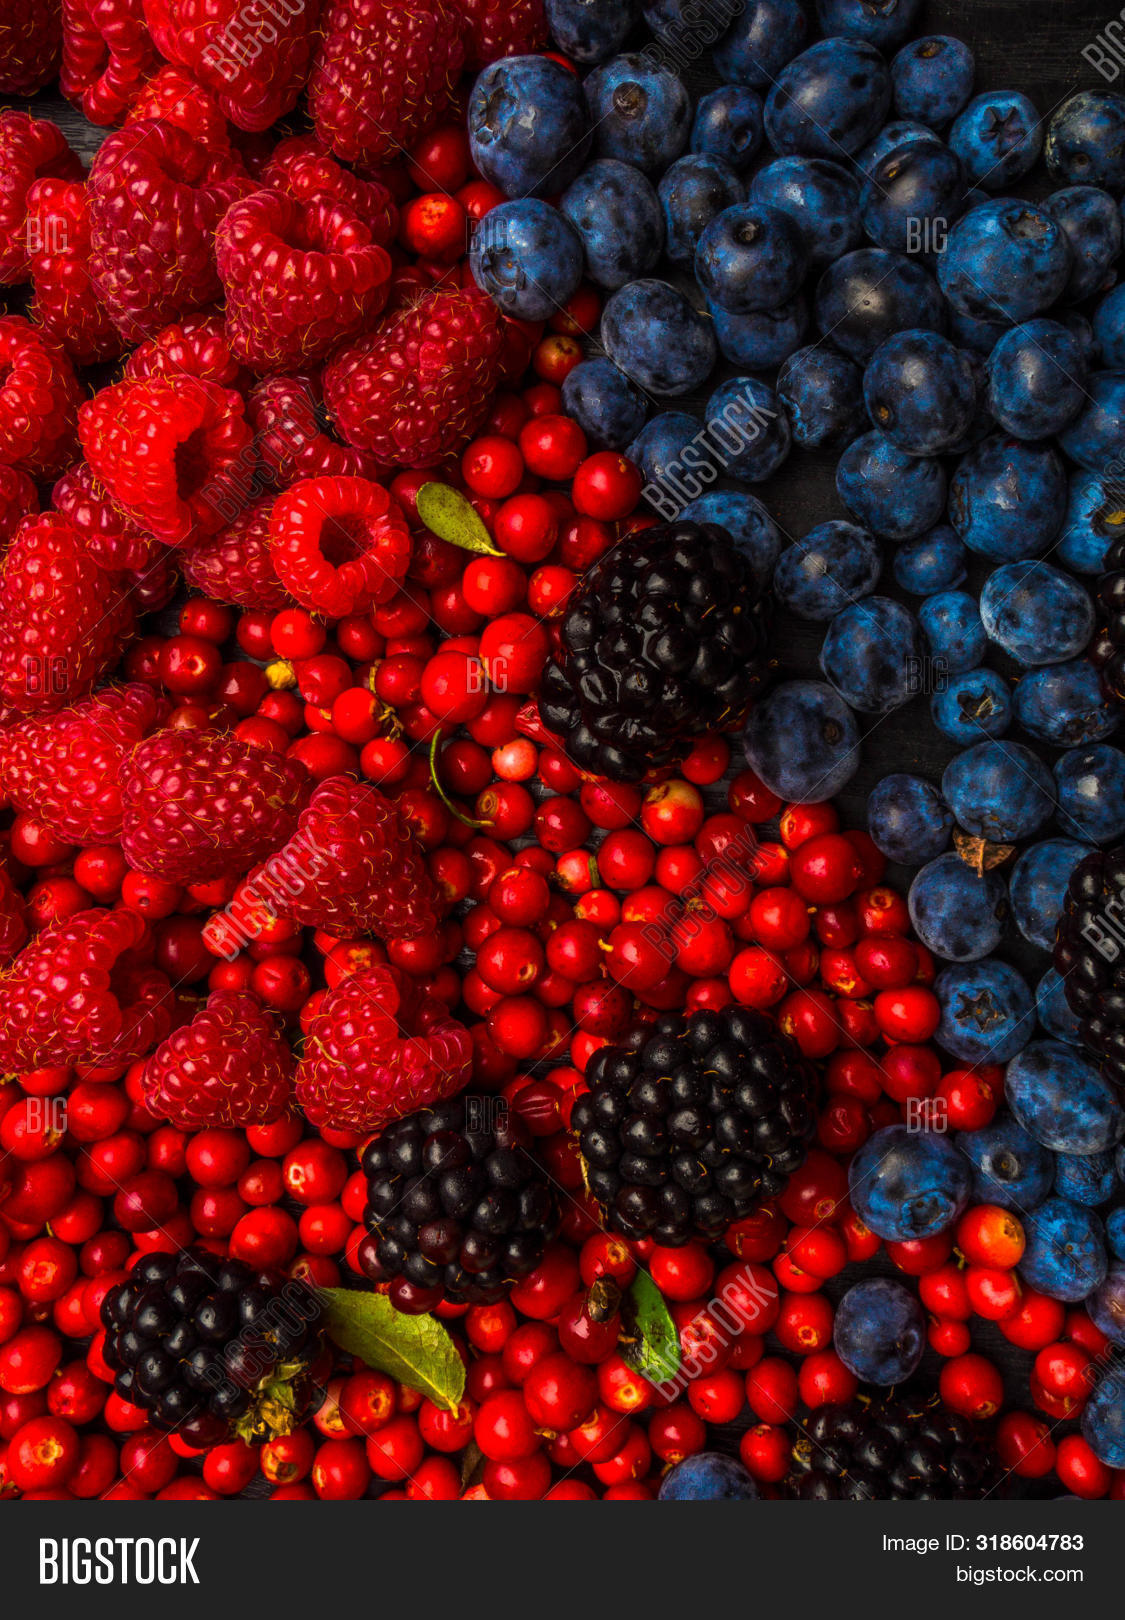 Super Antioxidants Image Photo Free Trial Bigstock